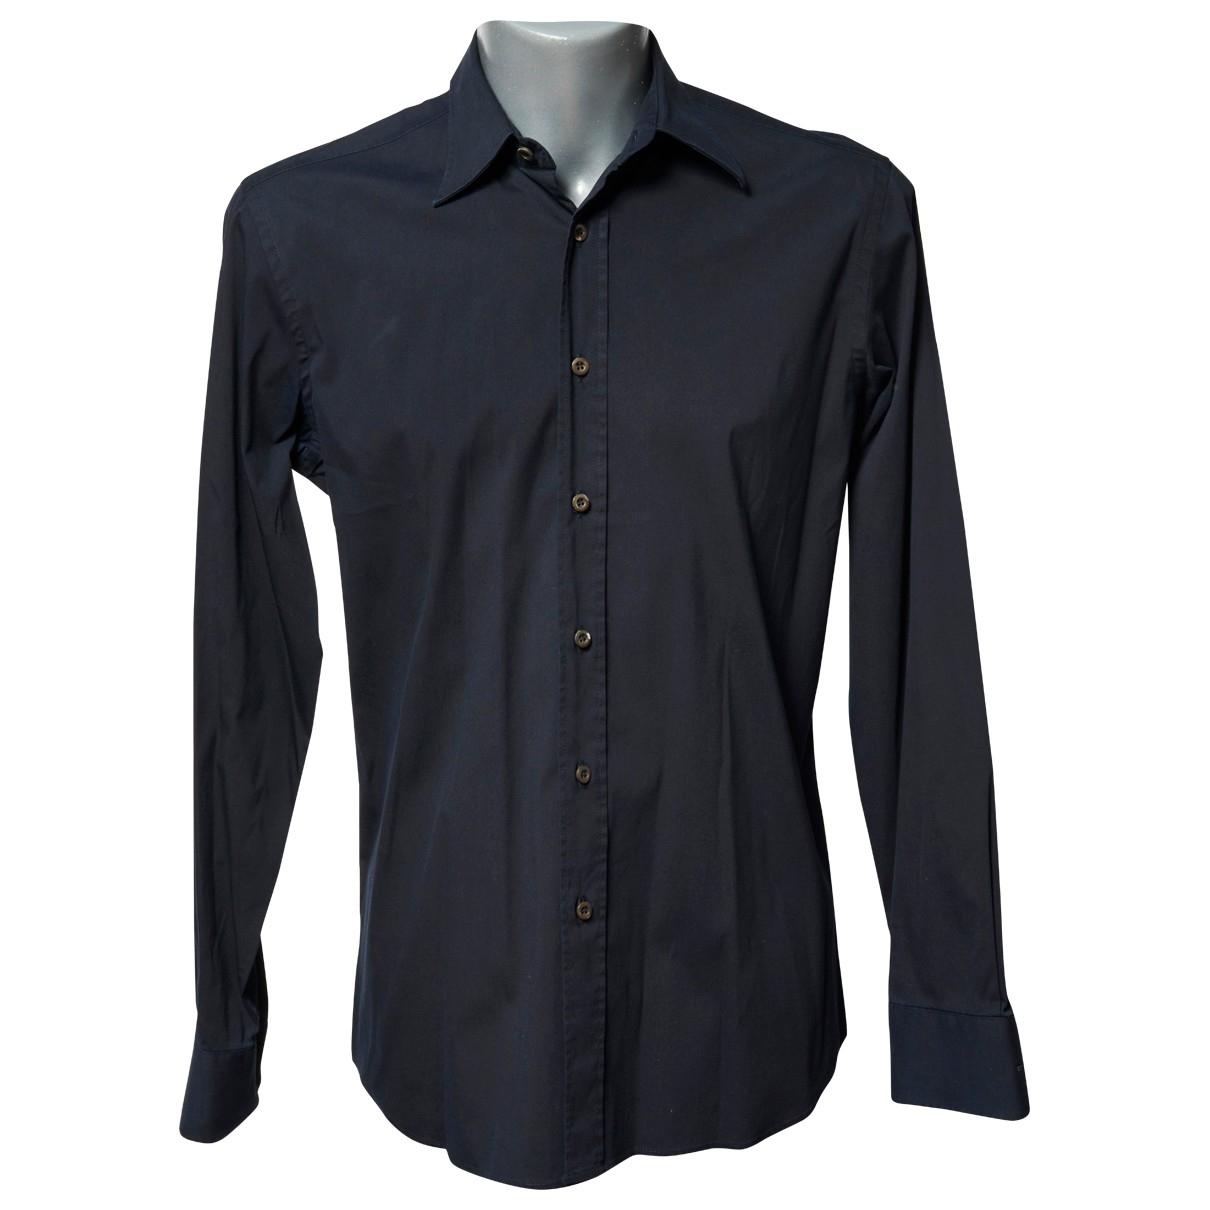 Prada \N Black Cotton Shirts for Men 39 EU (tour de cou / collar)